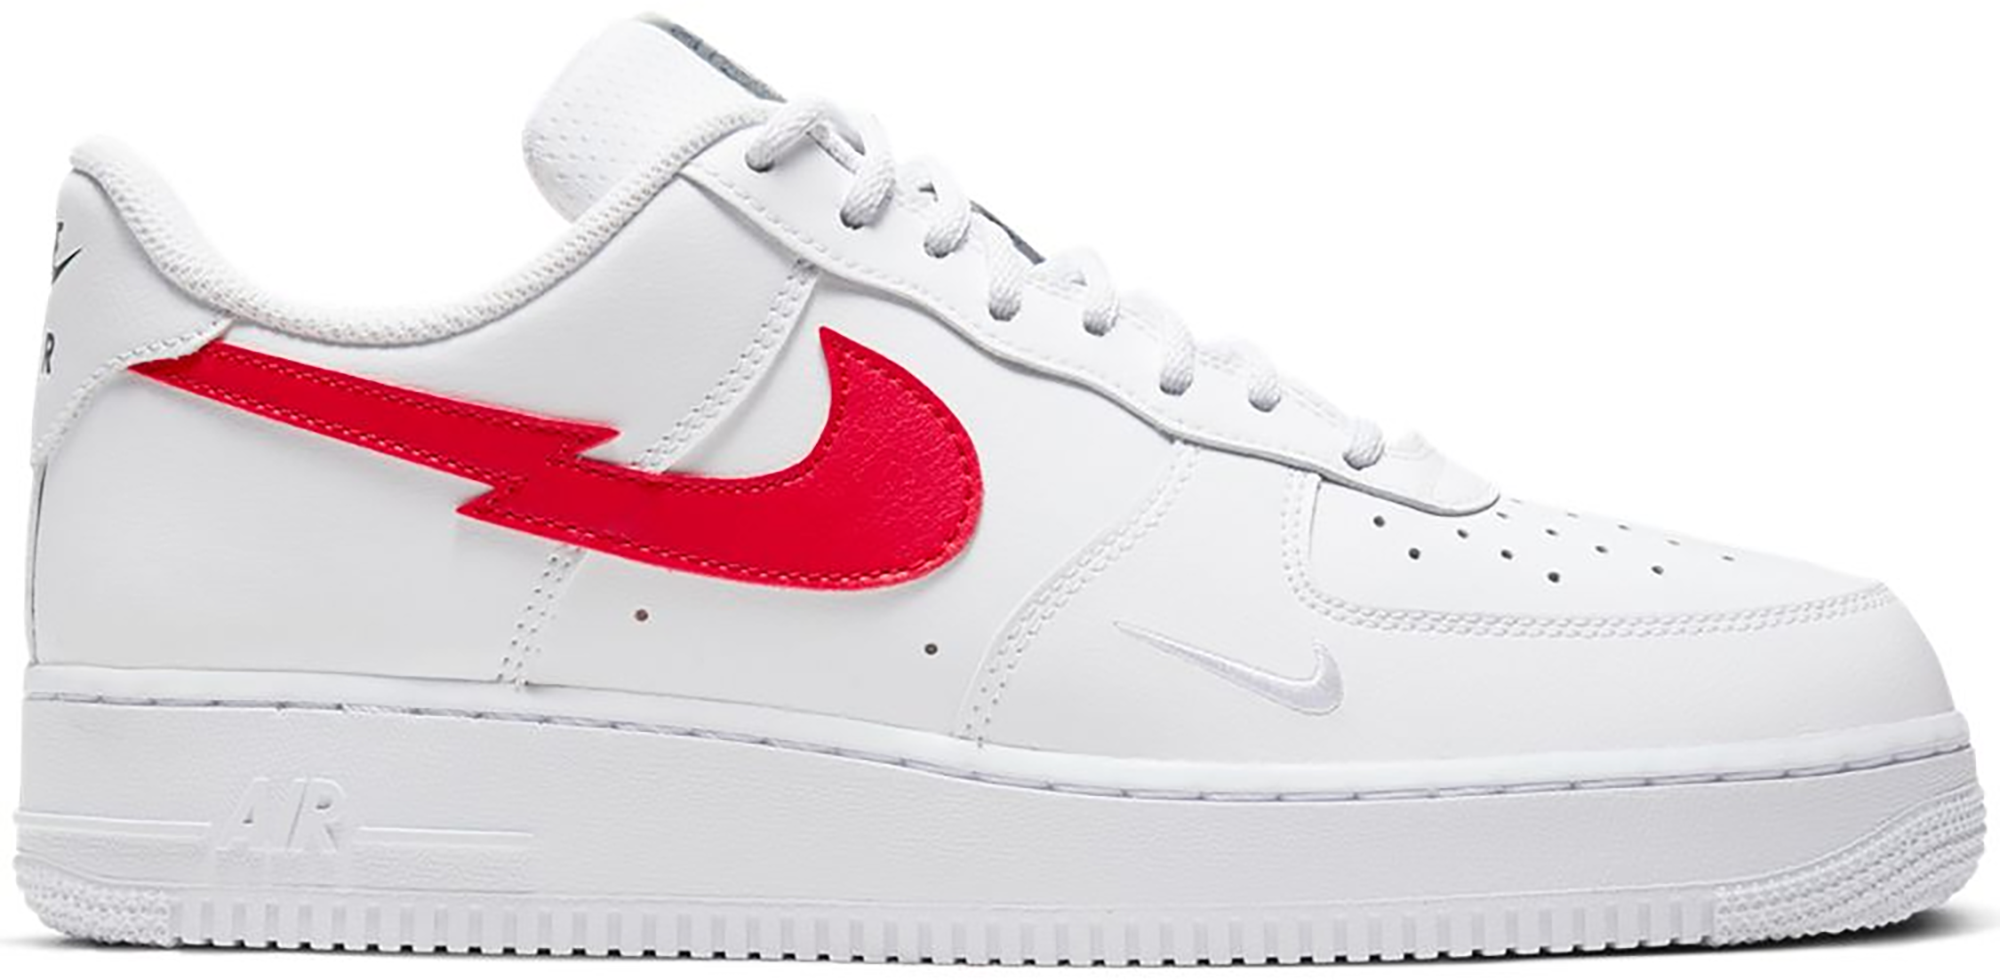 Nike Air Force 1 Low Euro Tour (2020